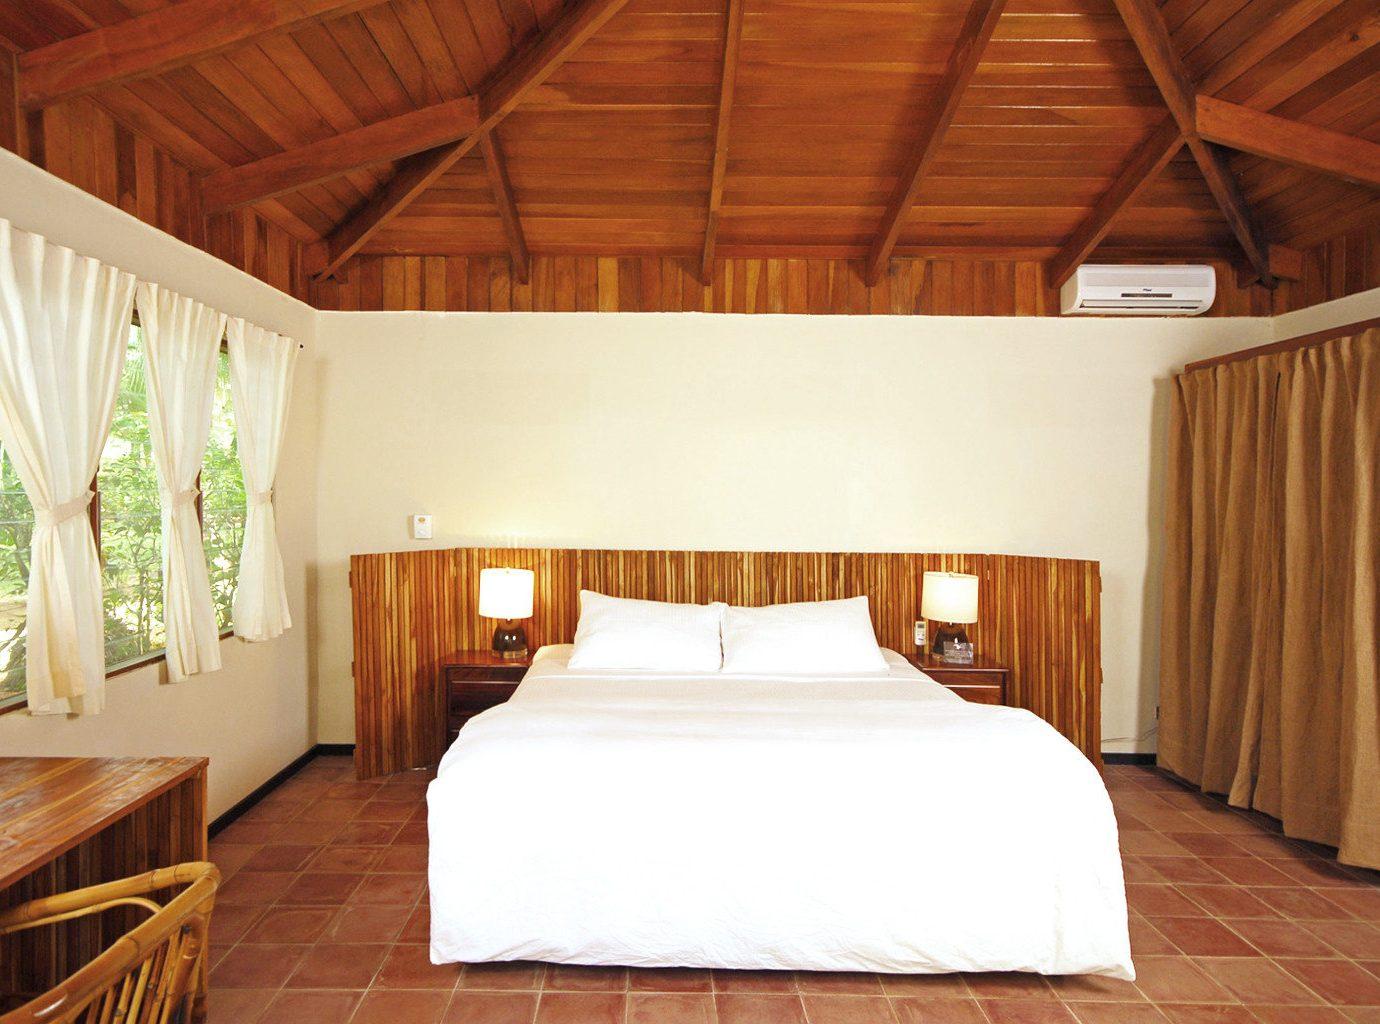 Bedroom at Harmony Hotel in Costa RIca